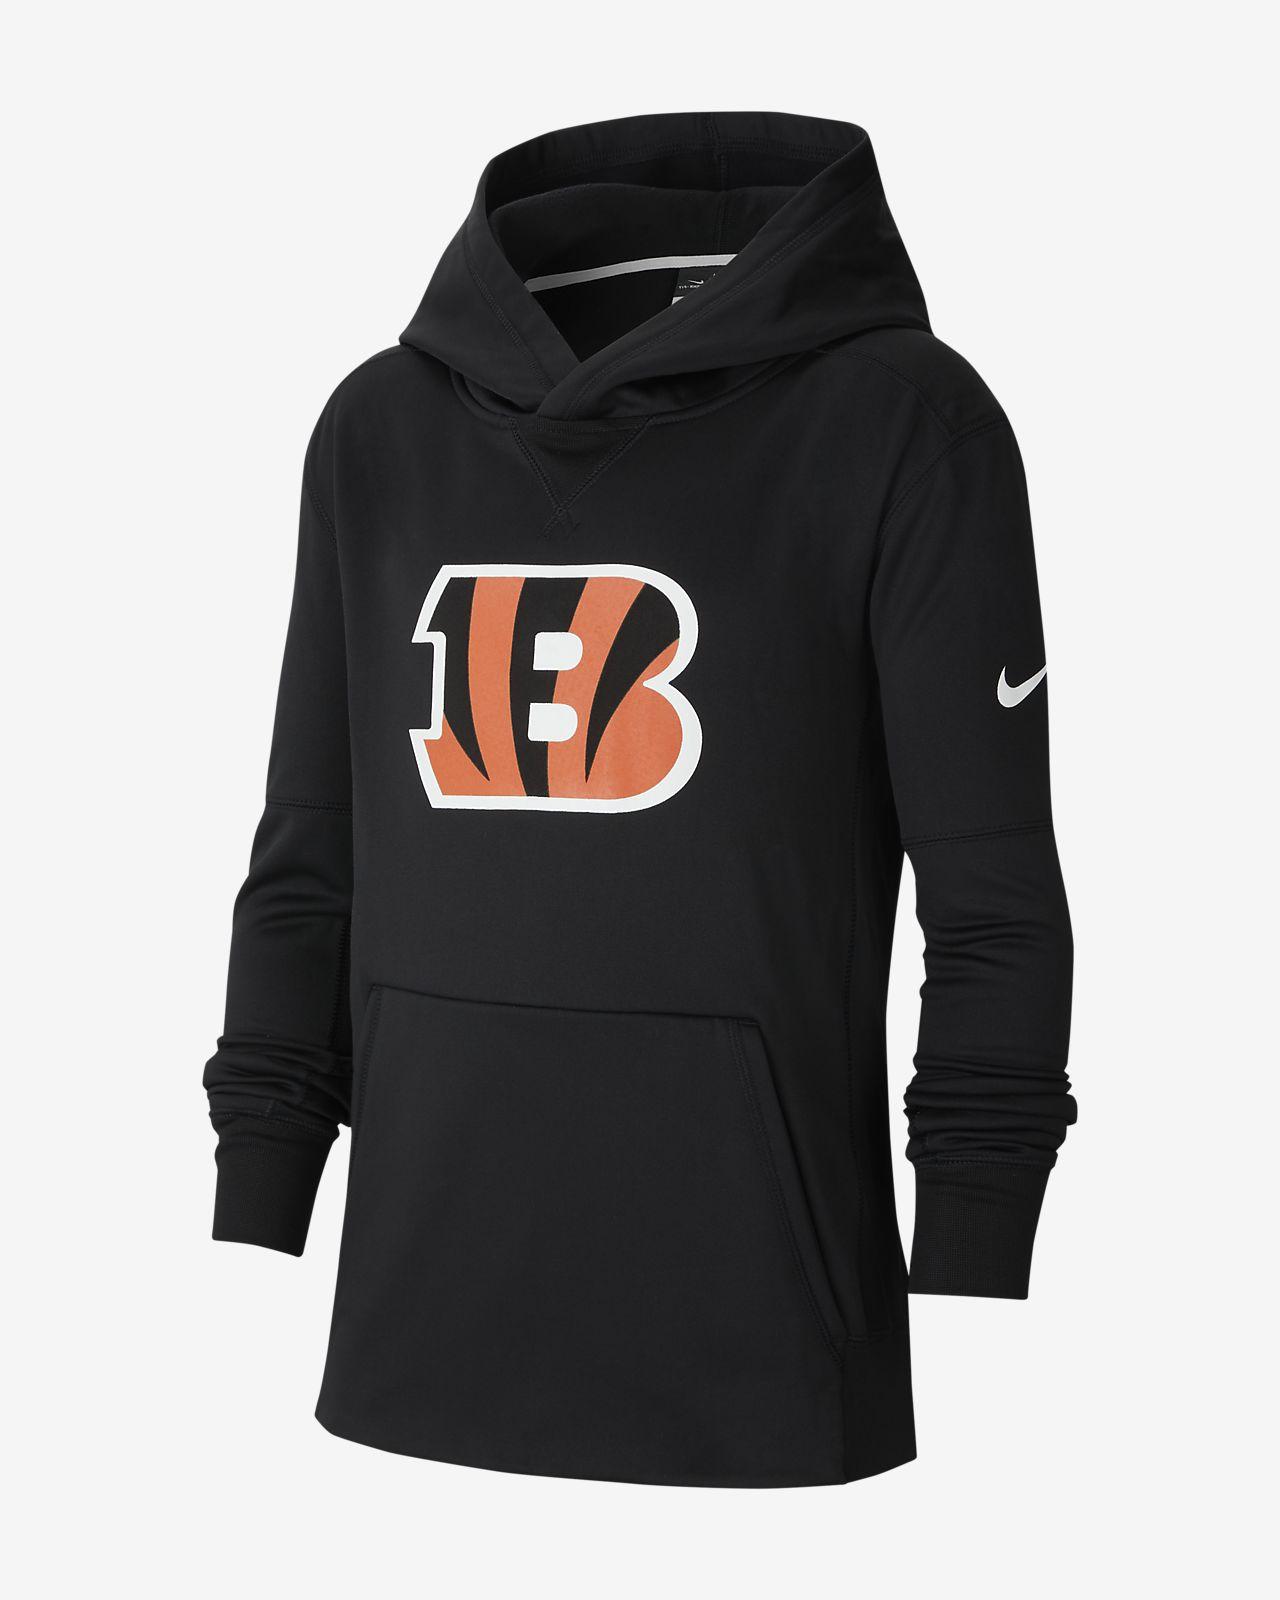 Nike (NFL Bengals) Big Kids' Logo Hoodie